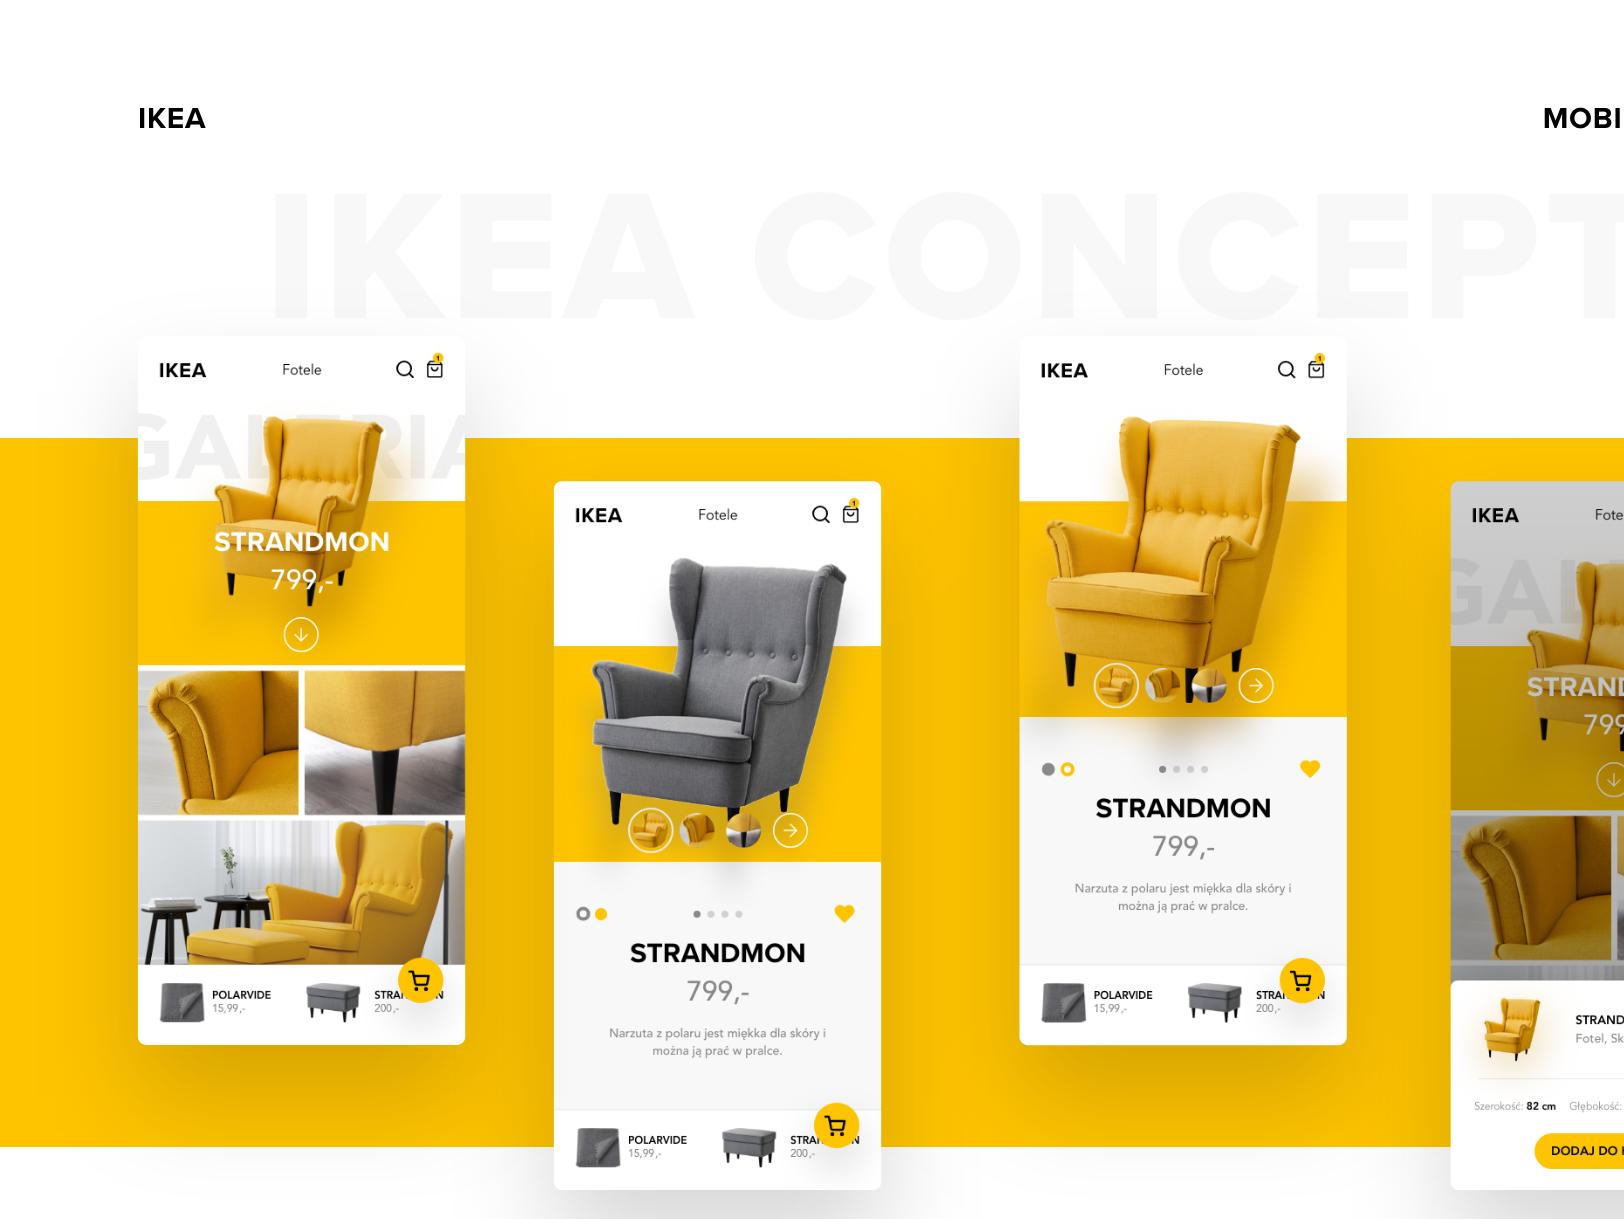 Ikea Mobile App By Damian On Dribbble